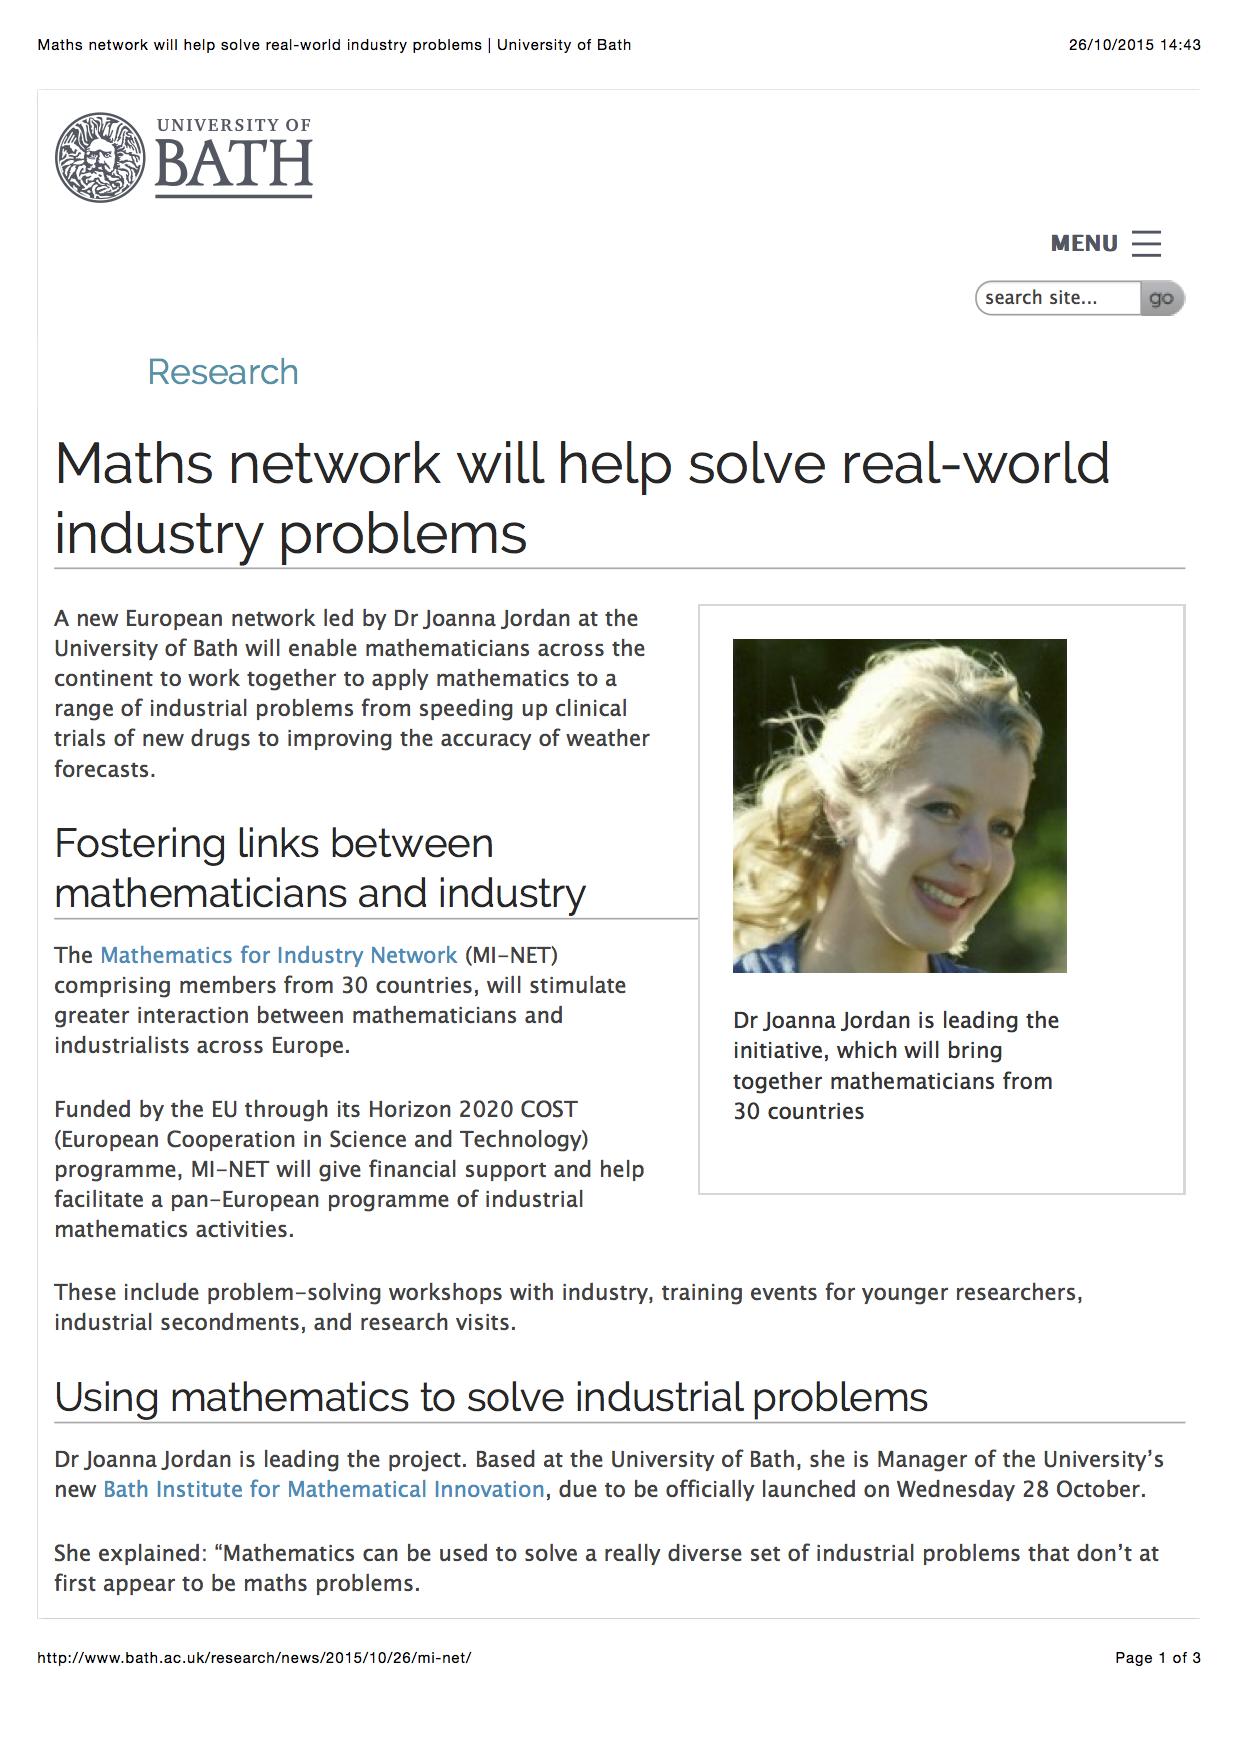 Solve network problems